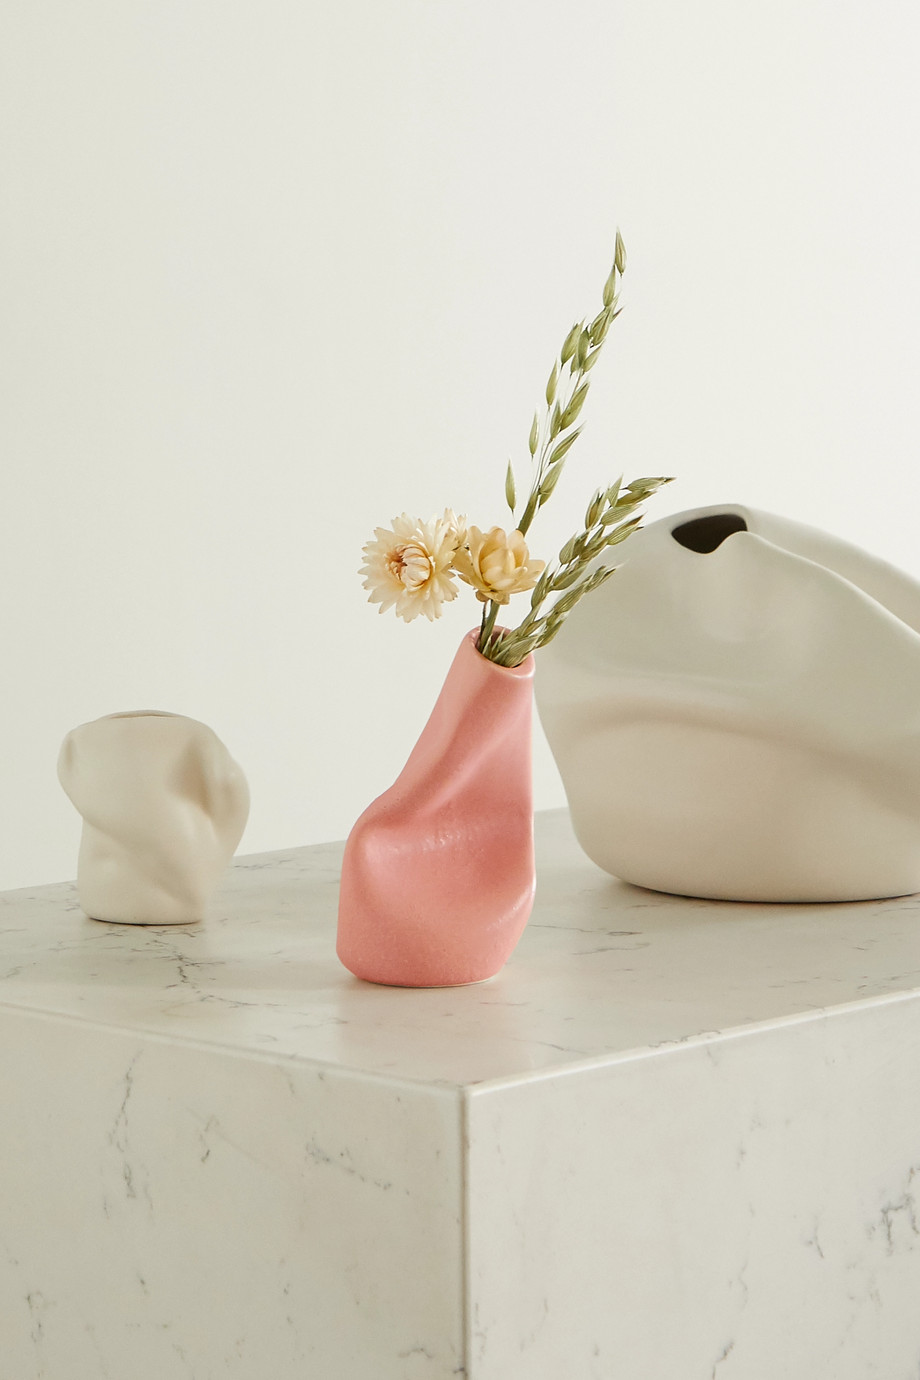 Completedworks + Ekaterina Bazhenova Yamasaki Solitude ceramic vase